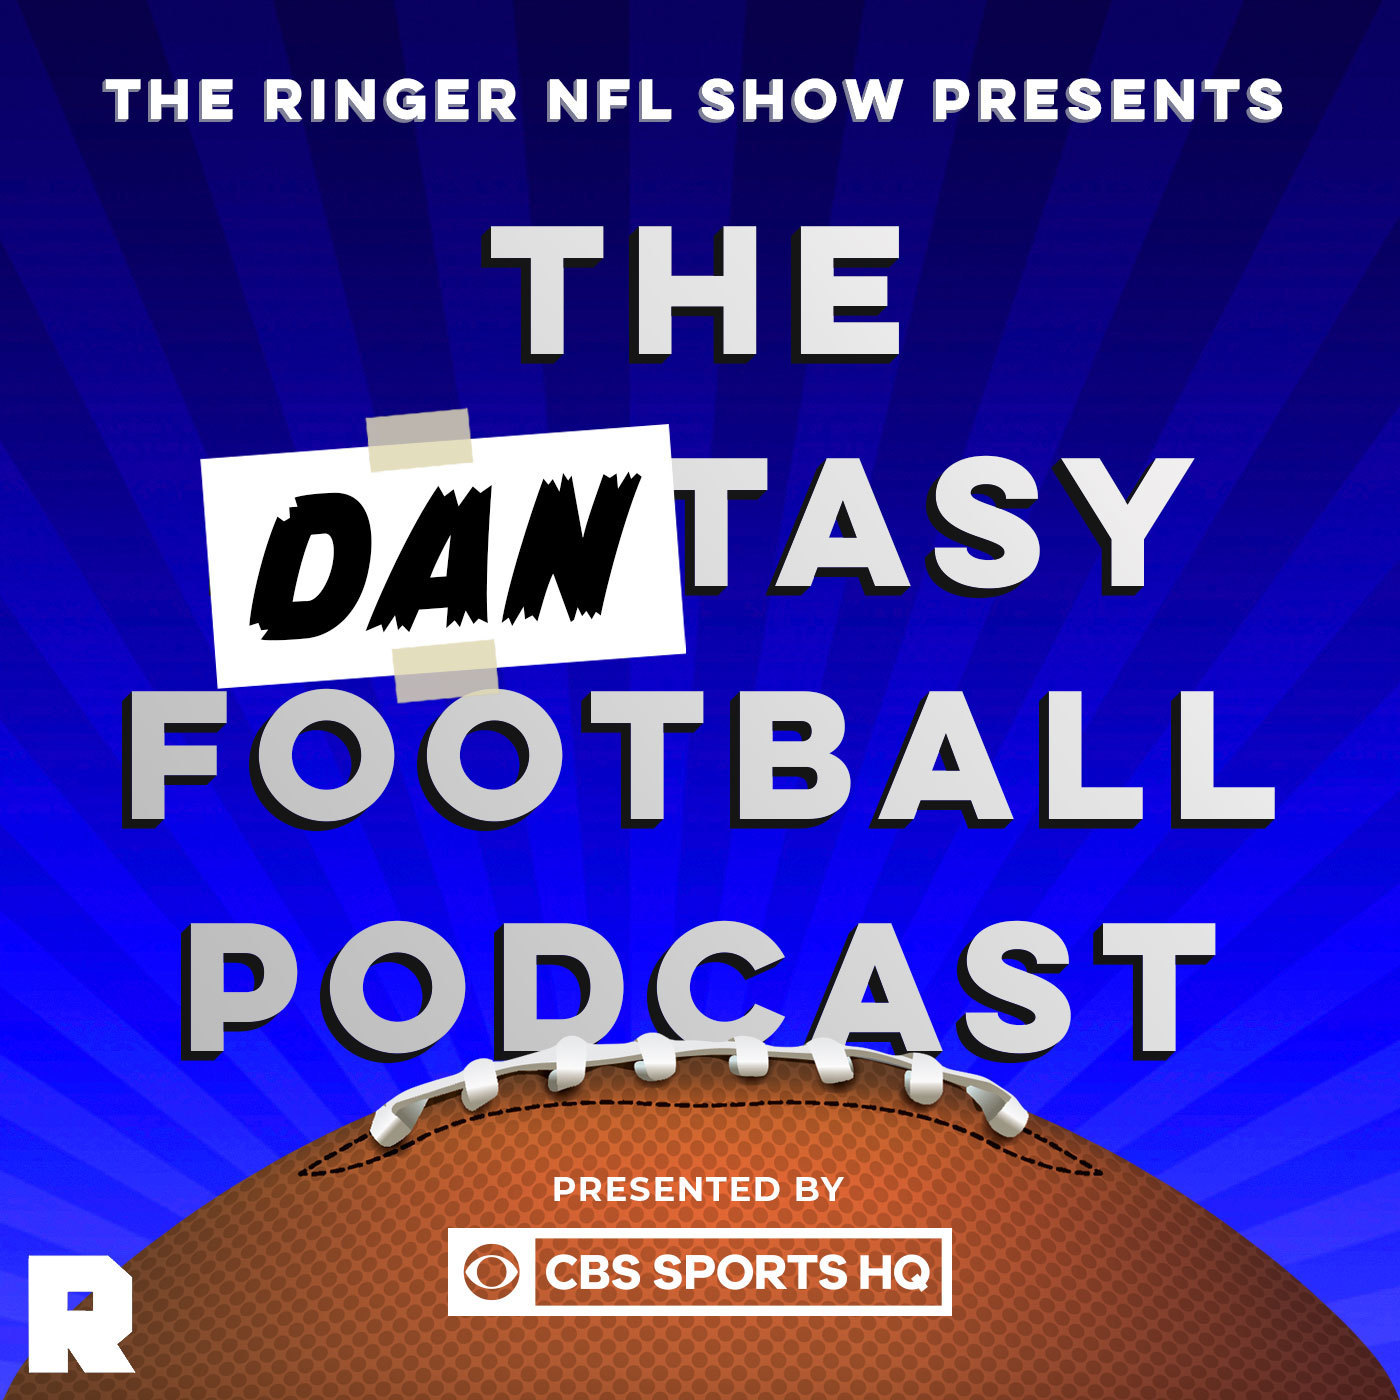 Key Week 2 Matchups and Our Daily Fantasy Lineup | The Dantasy Football Podcast